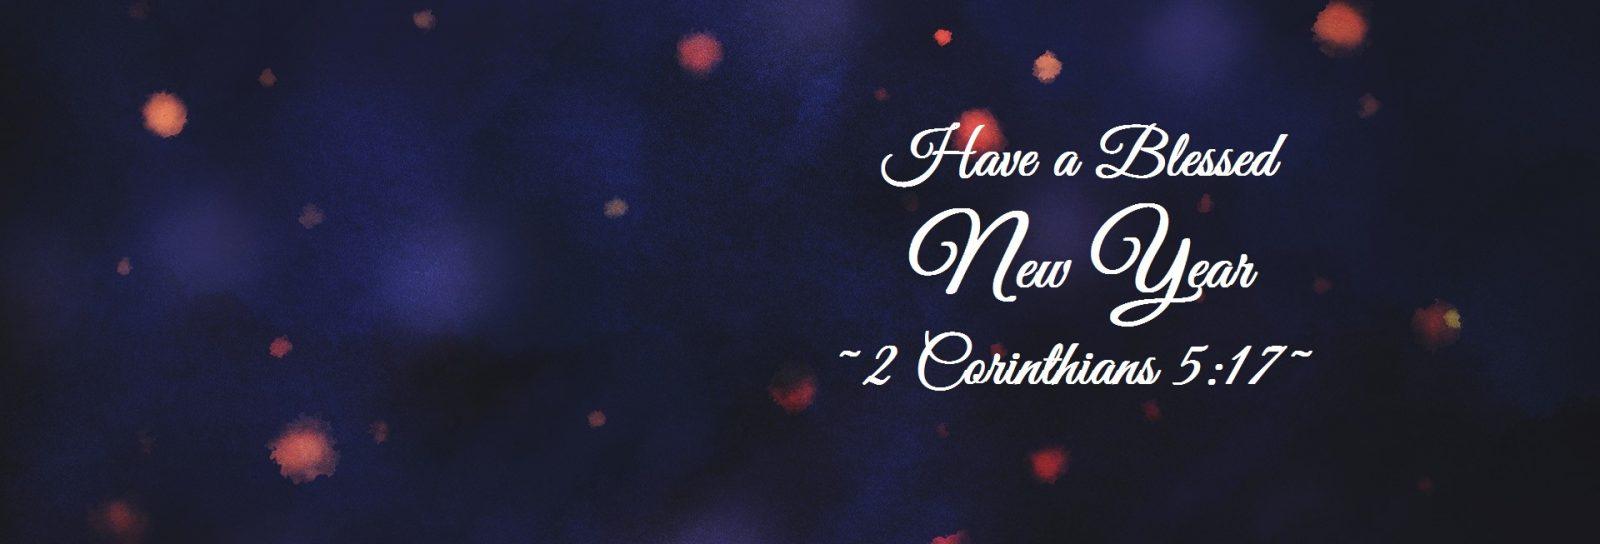 new year website banner